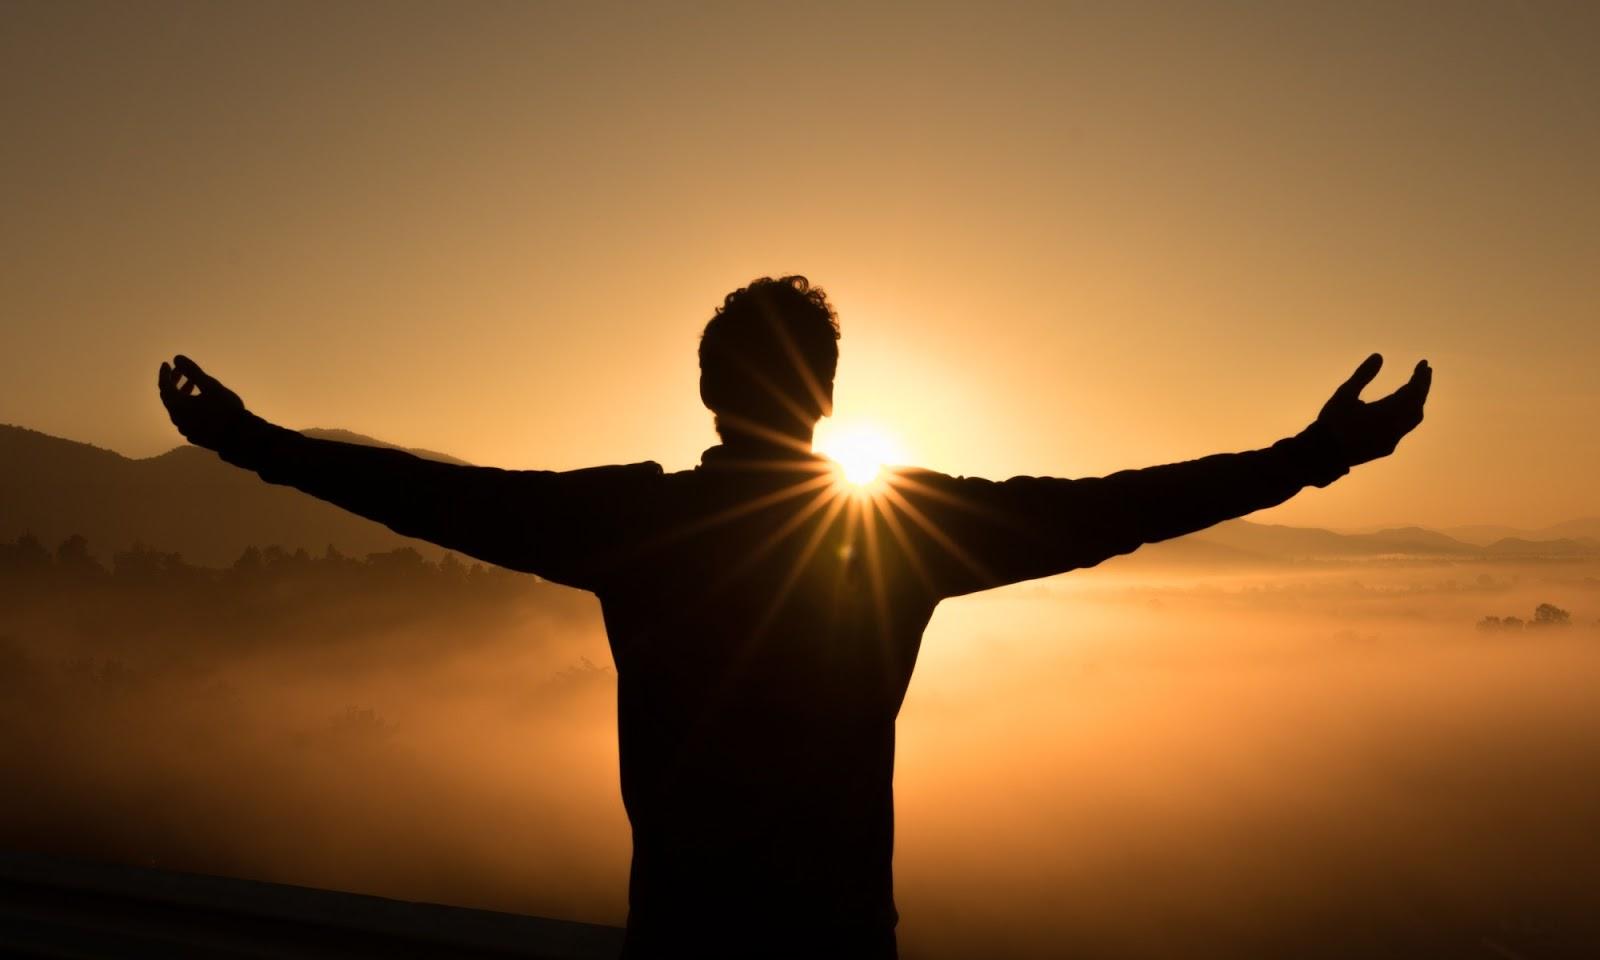 Renungan Harian: Jumat, 4 Juni 2021 - BAngga yang Mengandalkan Tuhan